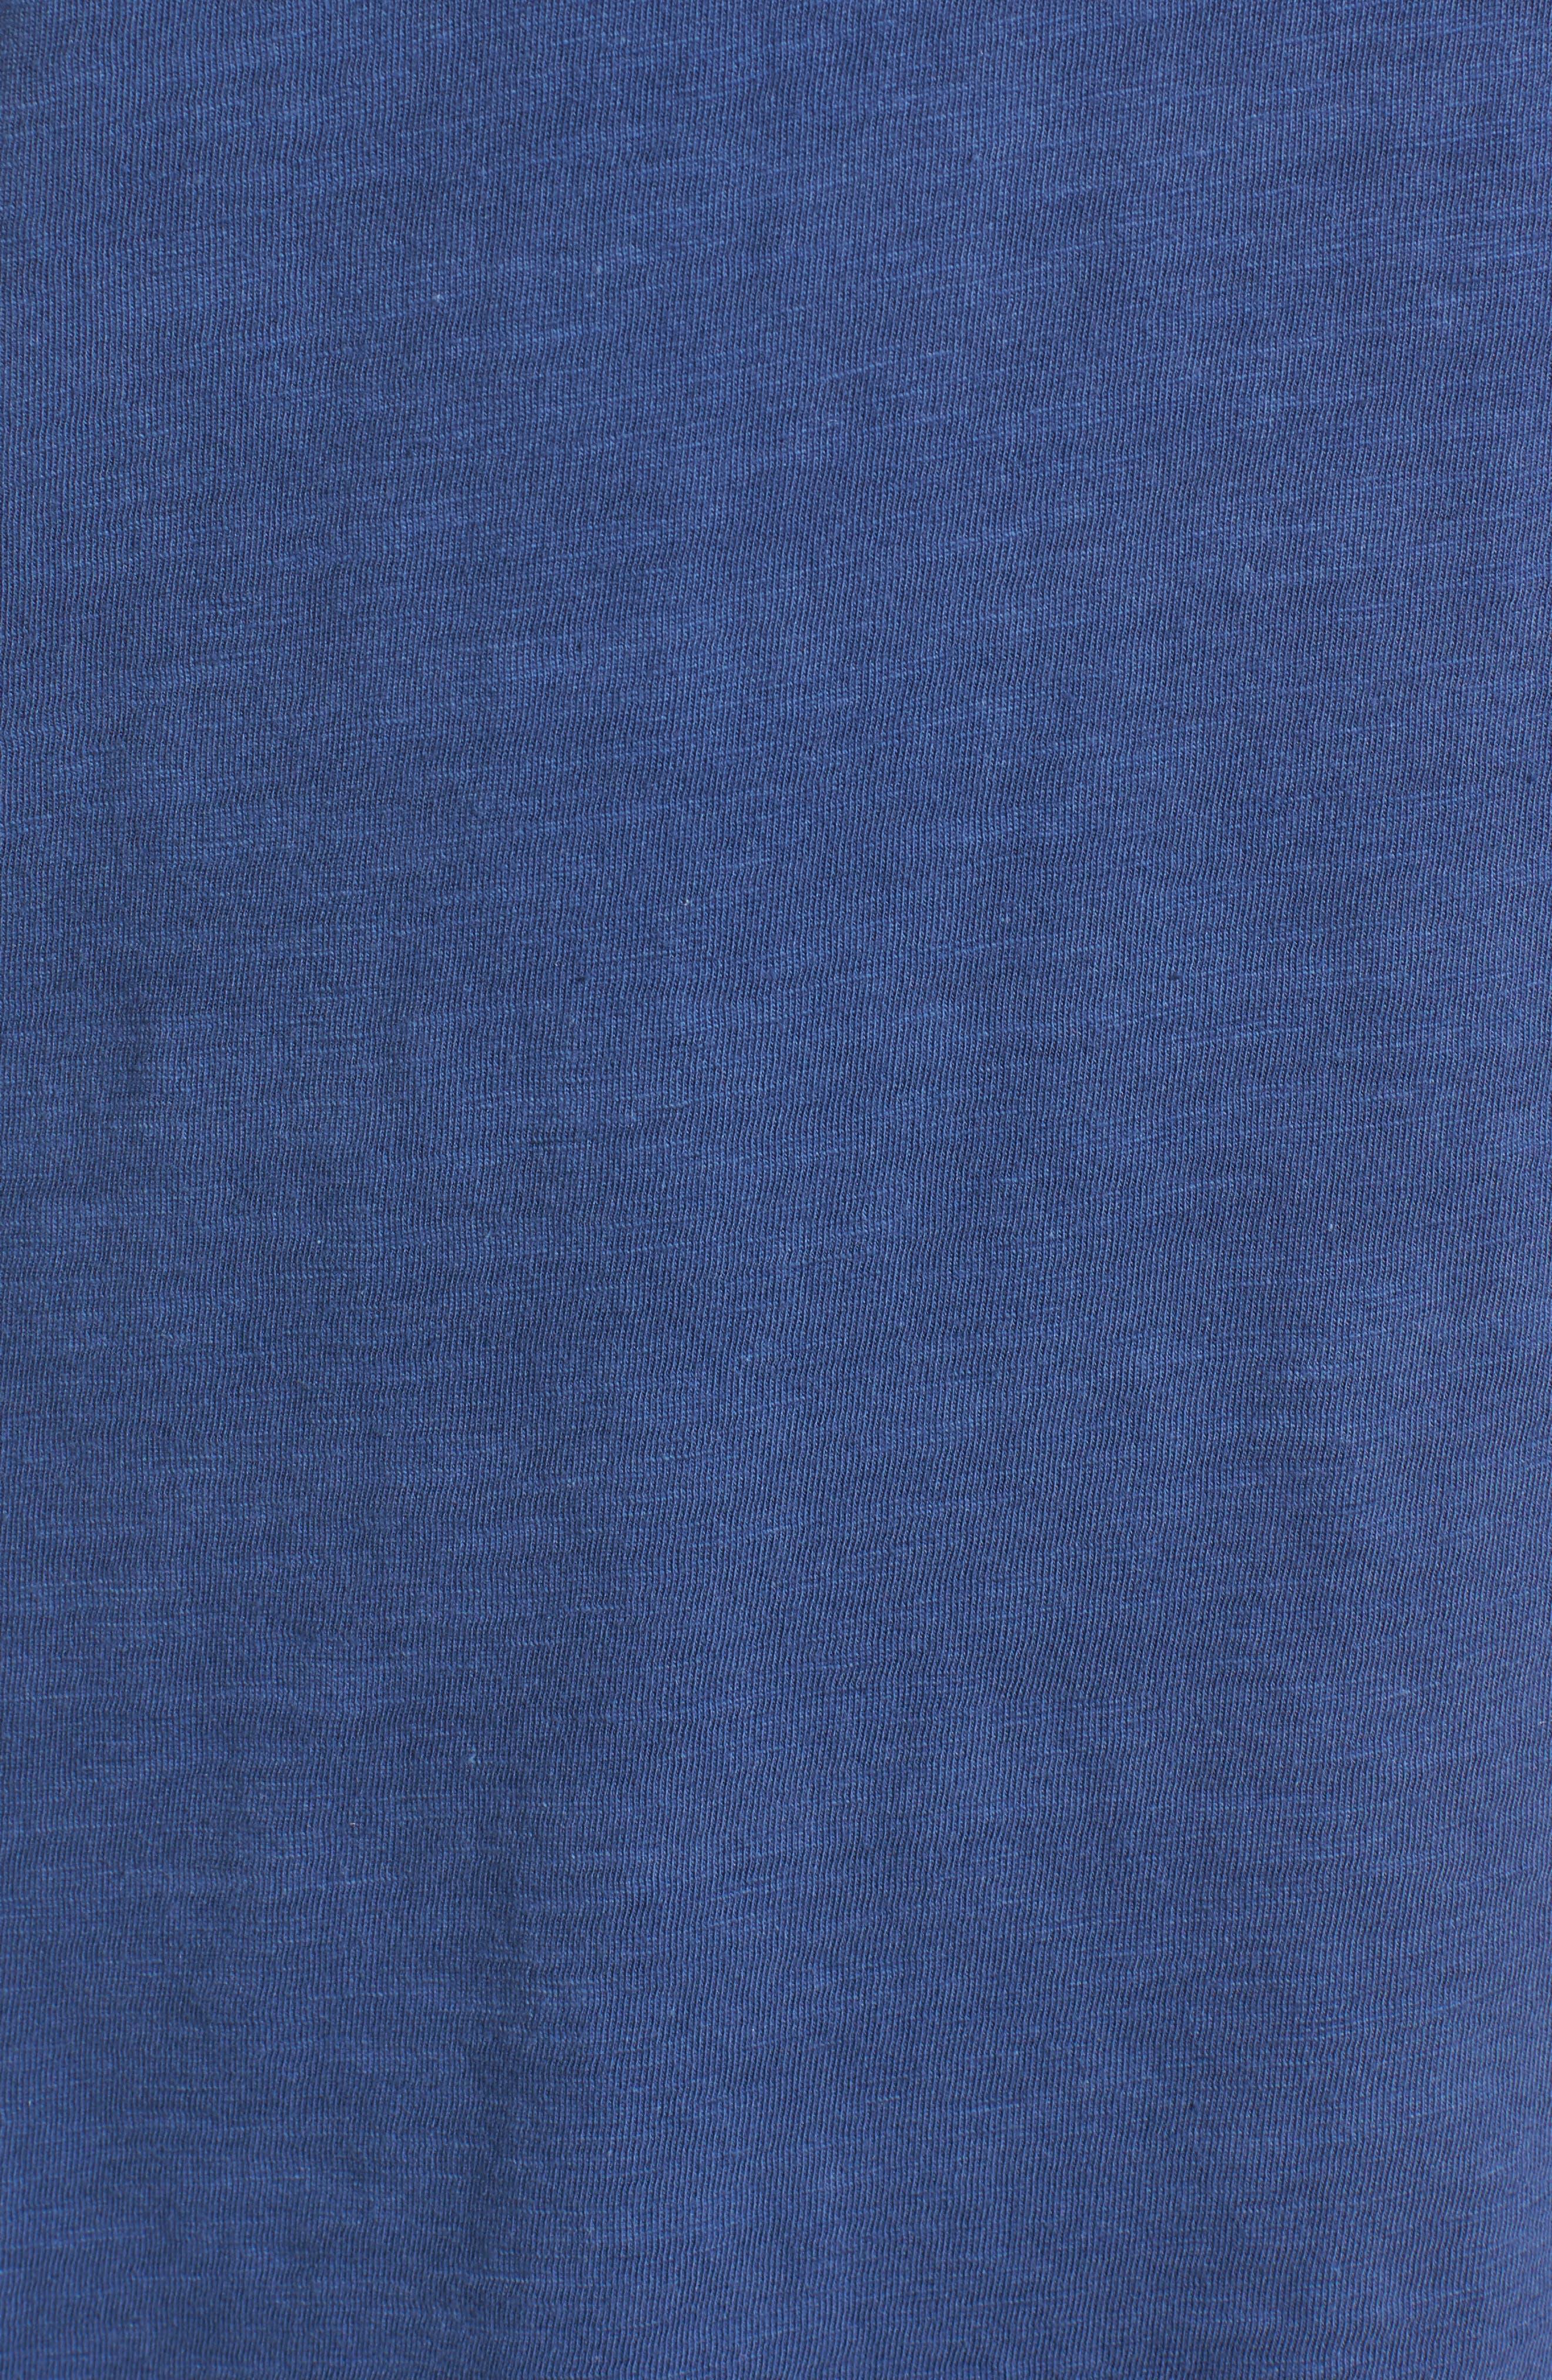 Organic Cotton V-Neck Tee,                             Alternate thumbnail 90, color,